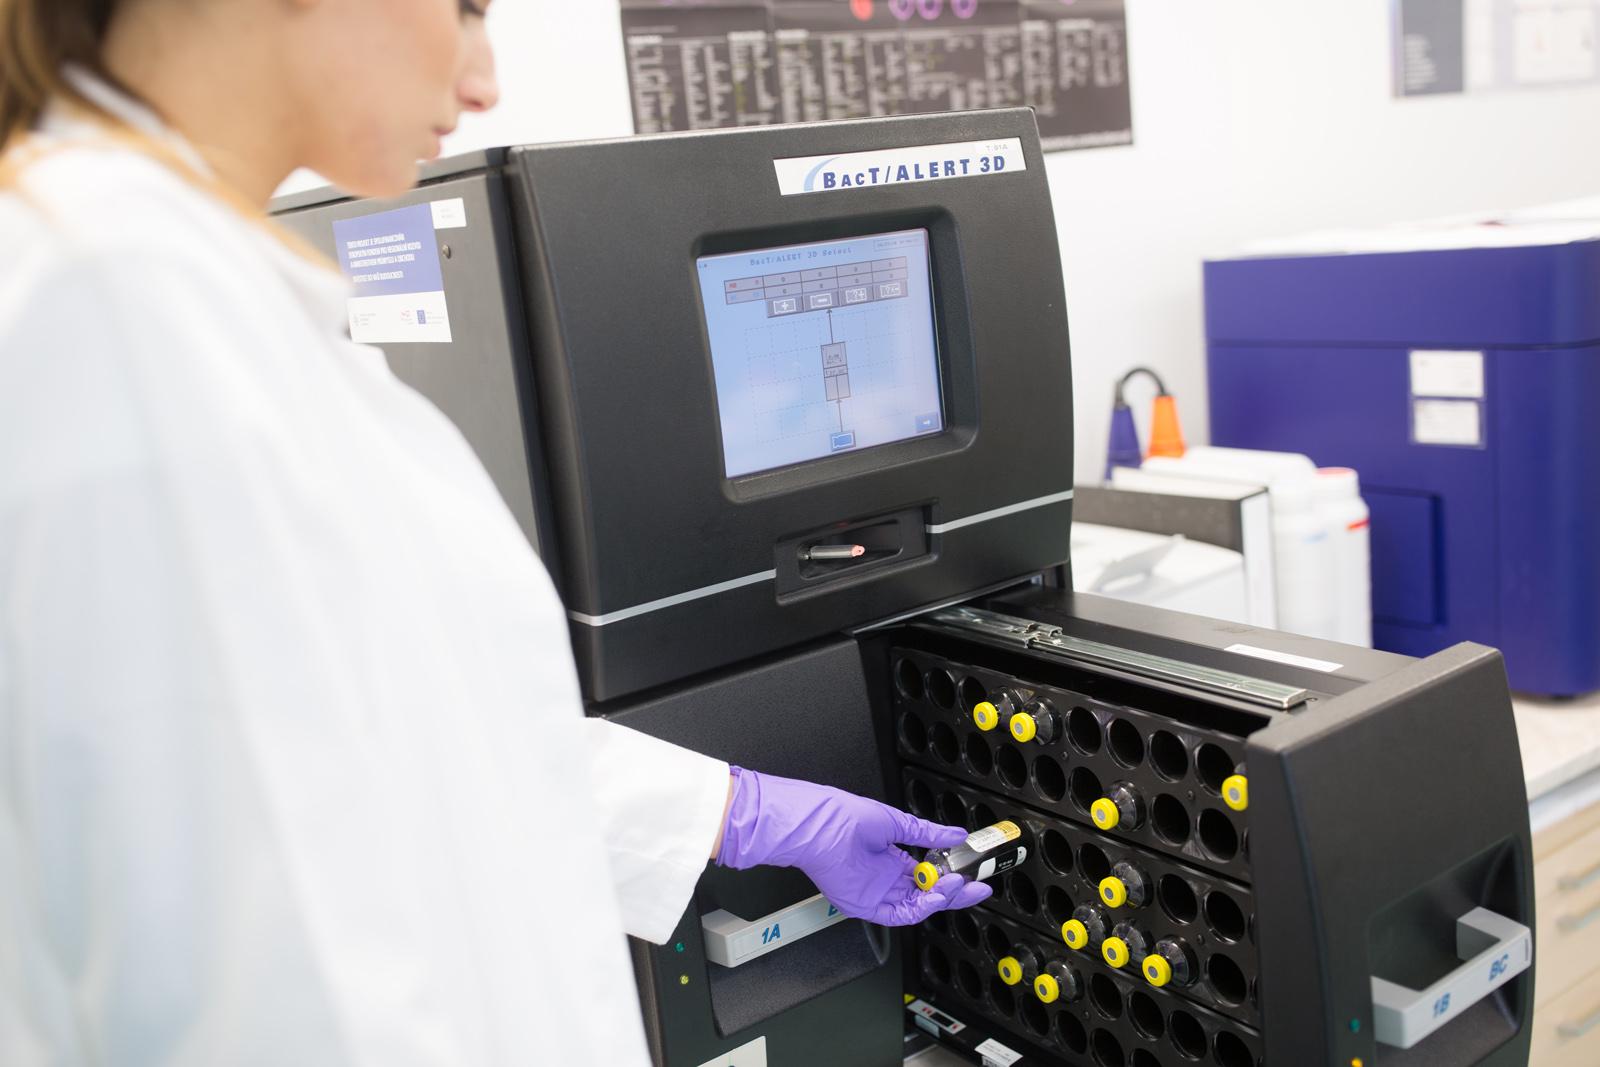 kontrola mikrobialni kontaminace na prostroji Bact Alert